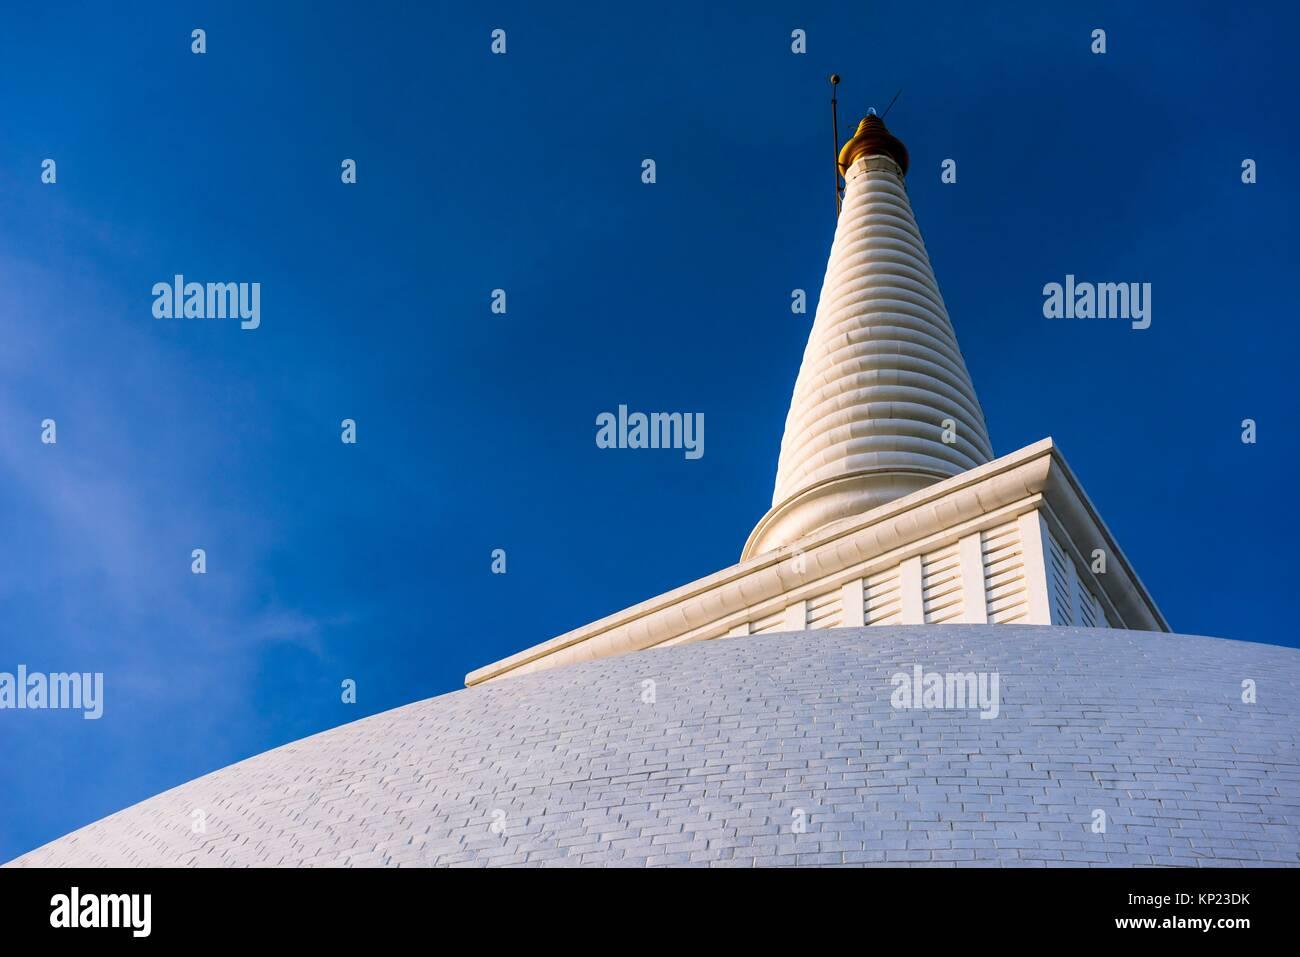 Pinnacle of Maha Seya Stupa, Mihintale Monastery, Anuradhapura District, North Central Province, Sri Lanka, Asia. - Stock Image